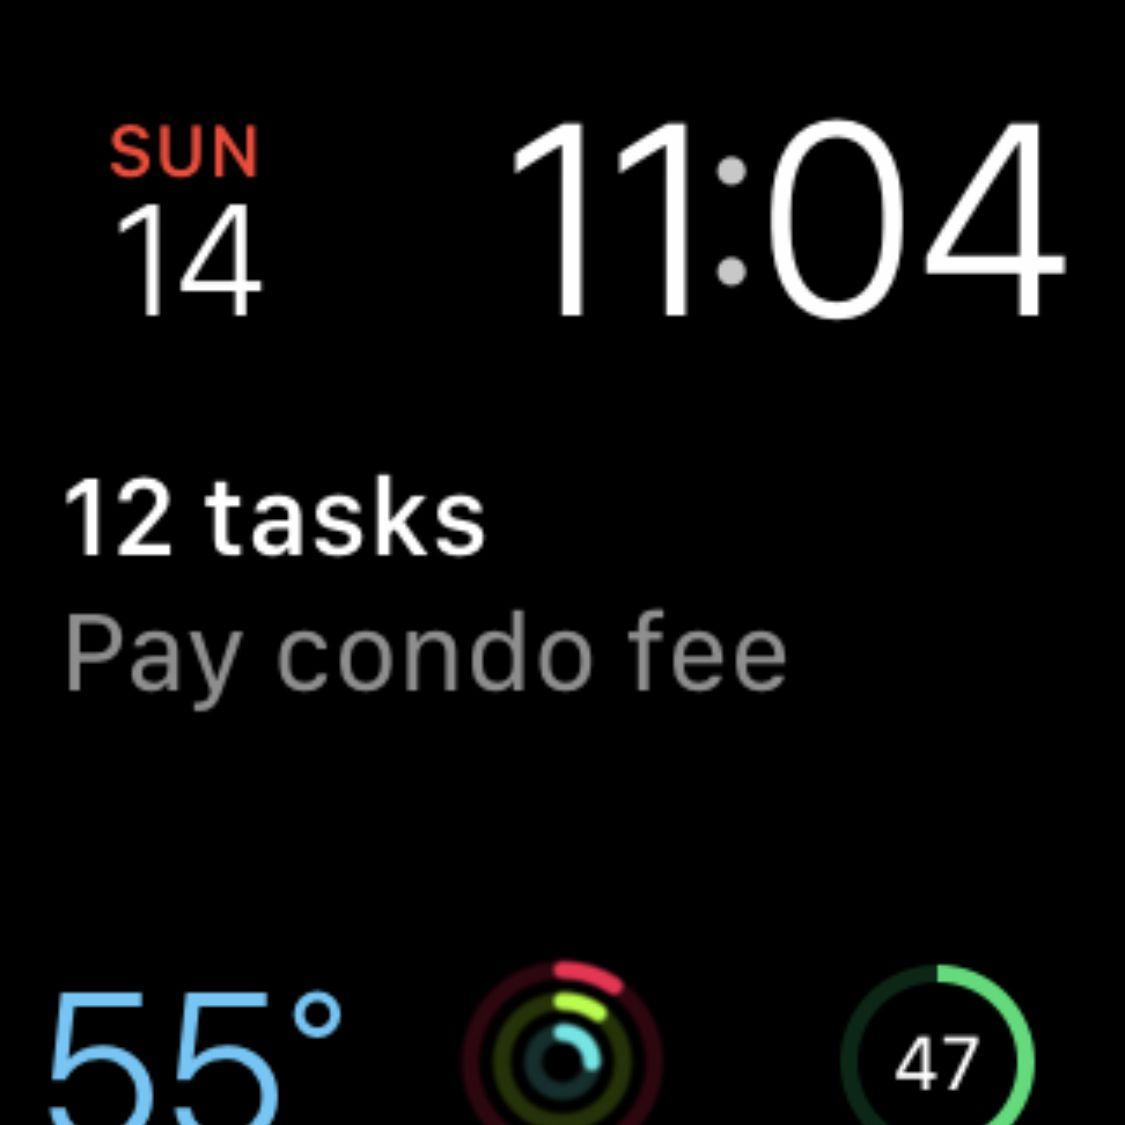 An Apple Watch screenshot viewed in the iPhone Photos app